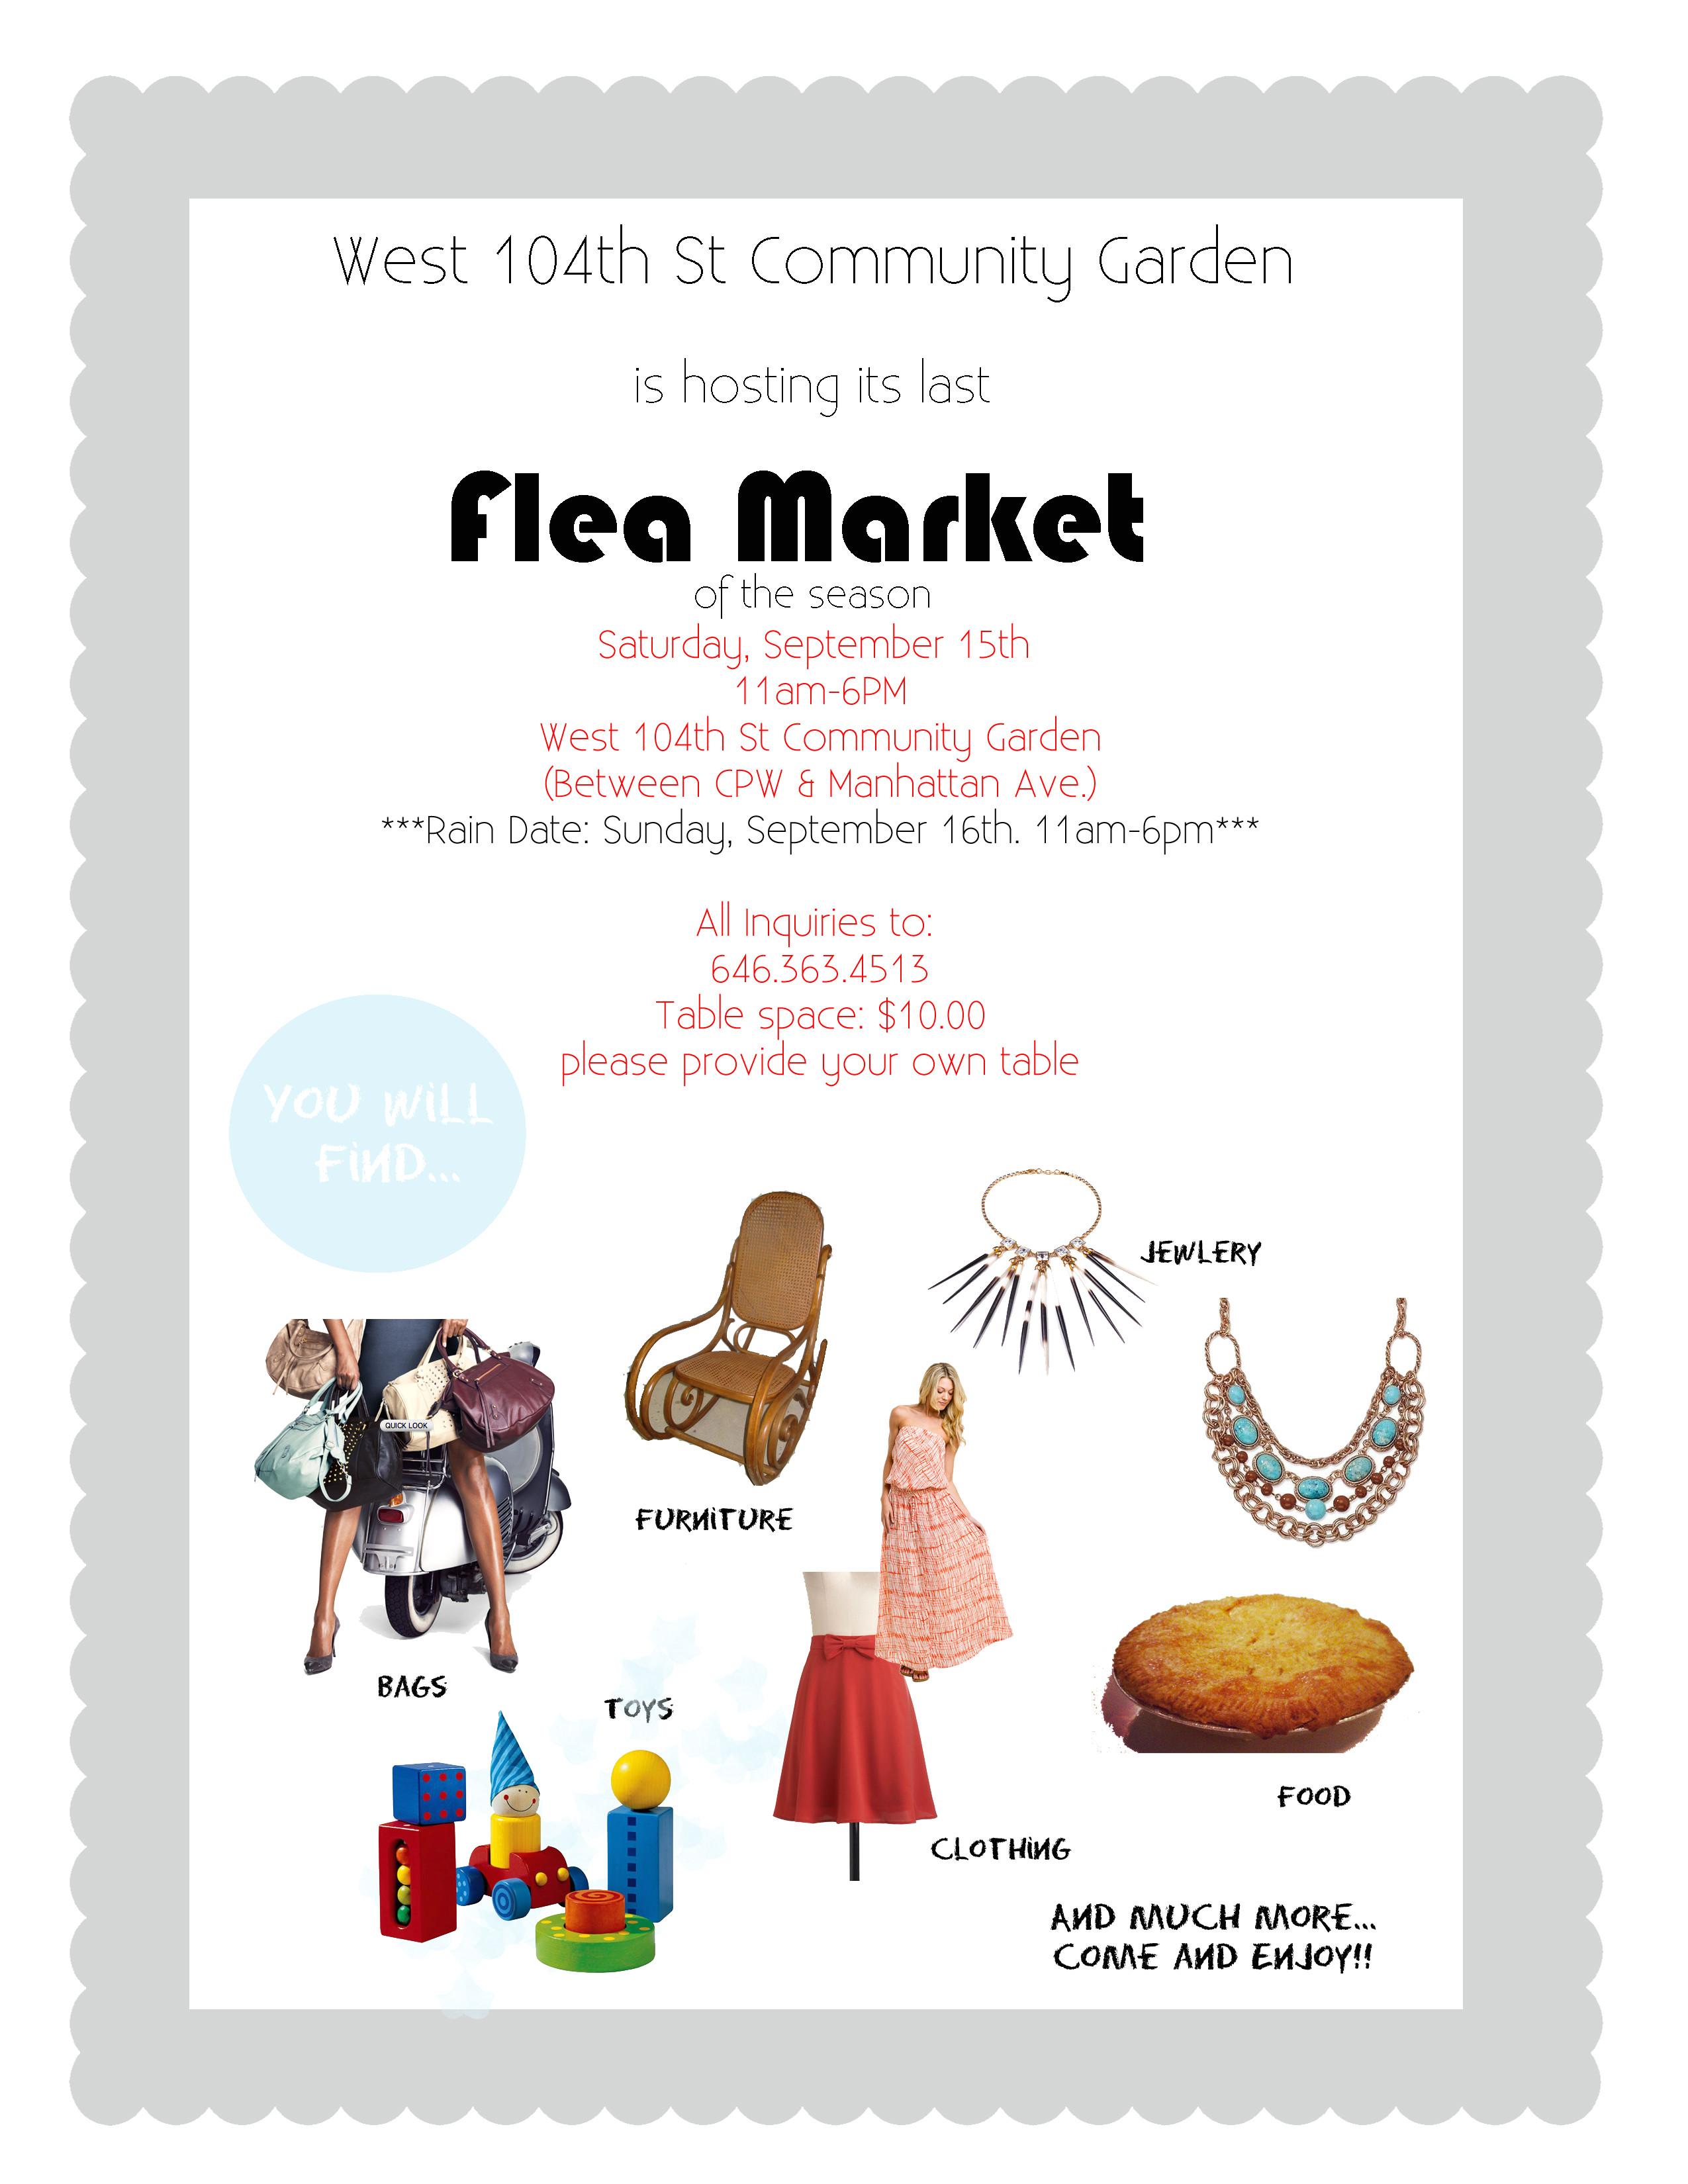 flea market logo cliparts